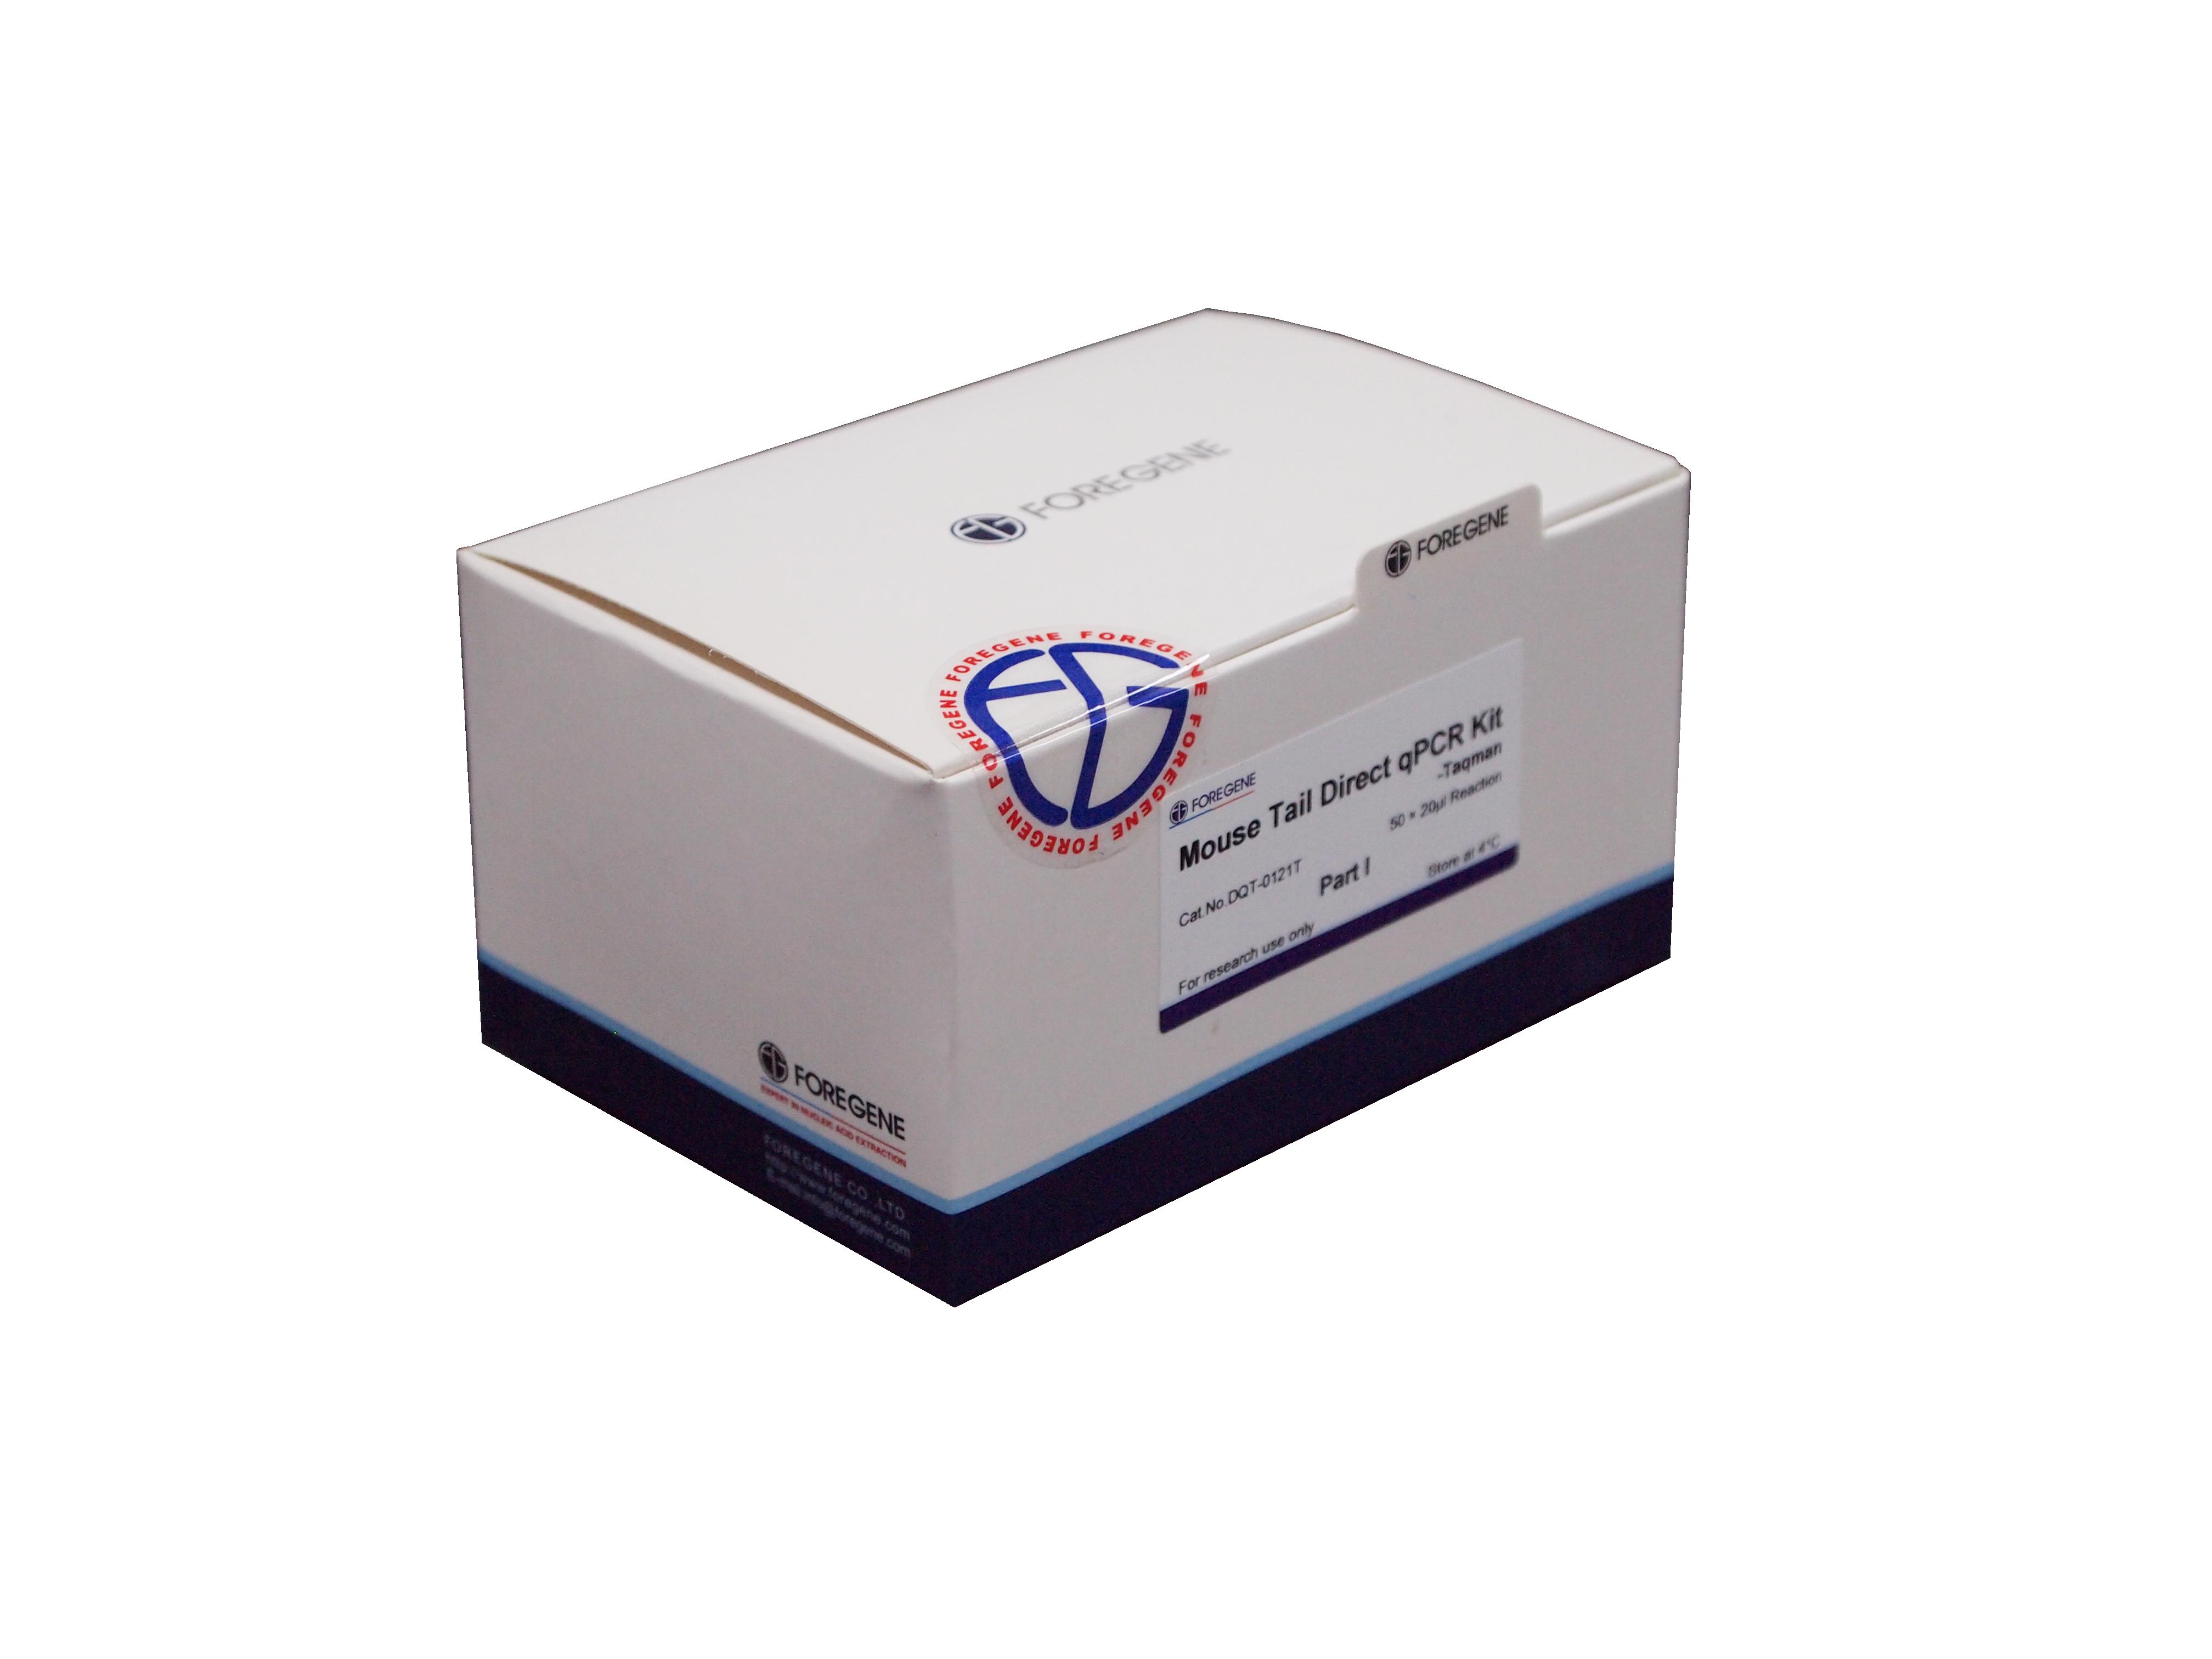 Taqman探针法鼠尾直接qPCR试剂盒